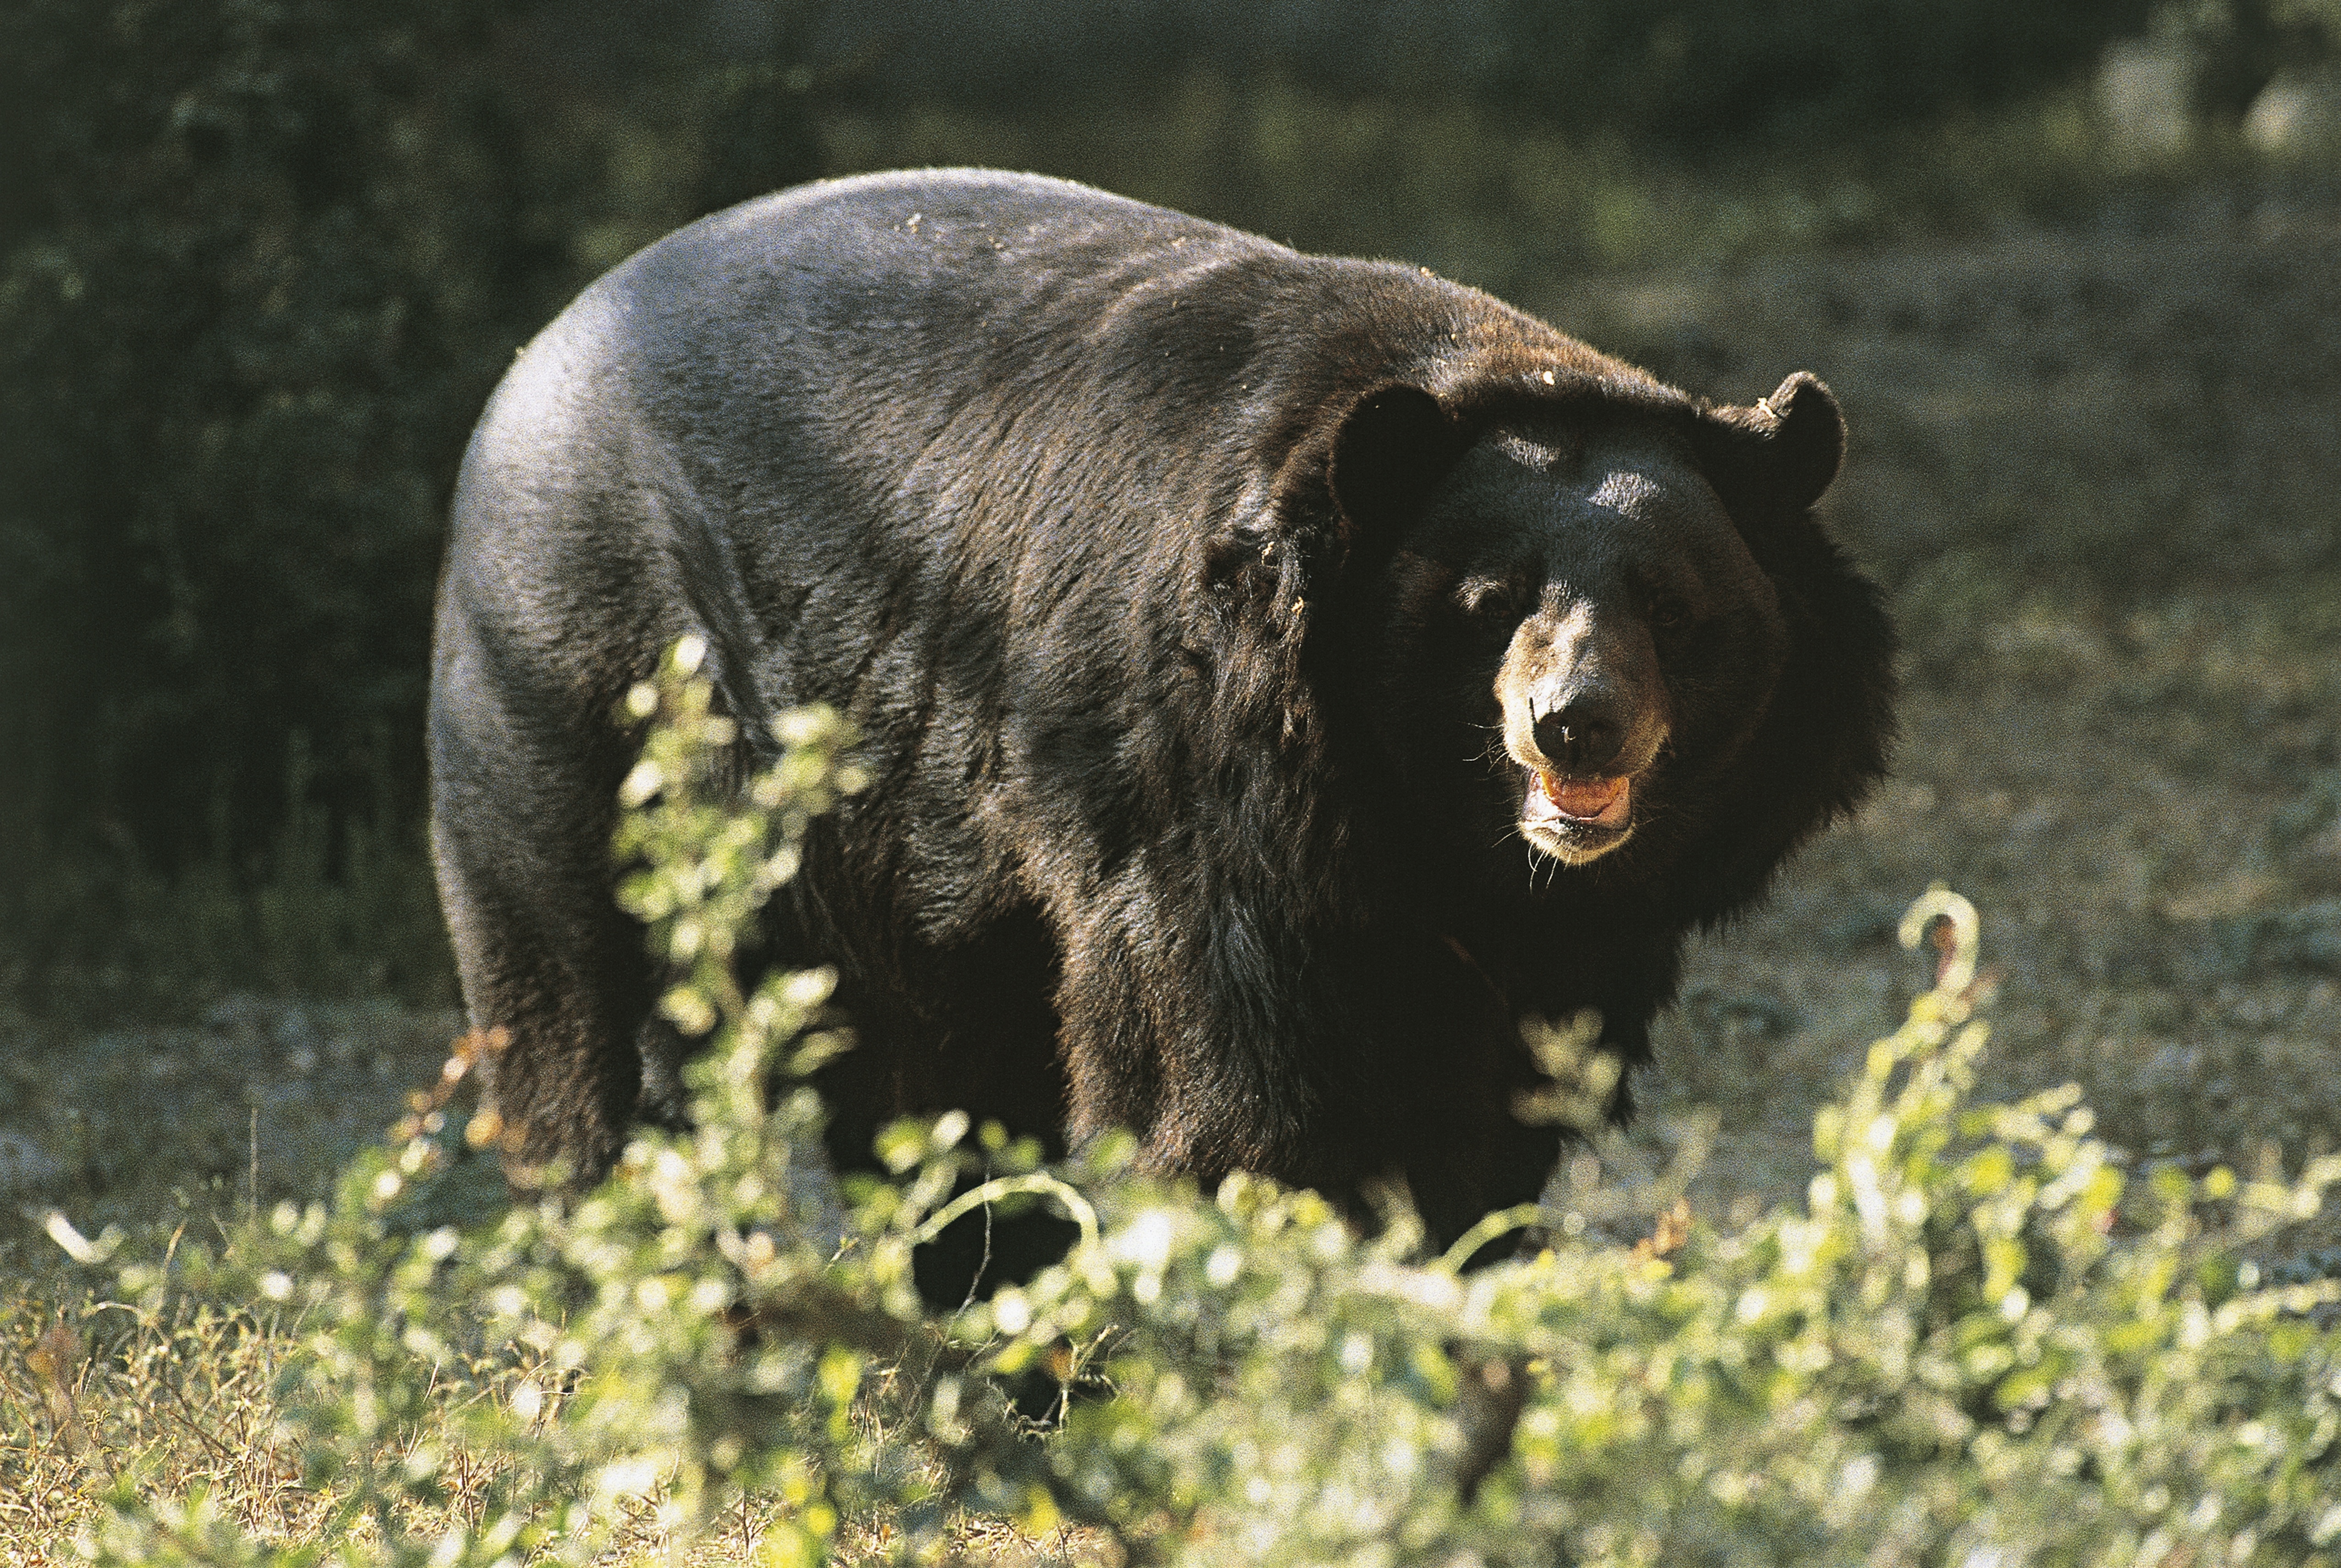 Asian black bear standing in the forest (Ursus thibetanus)